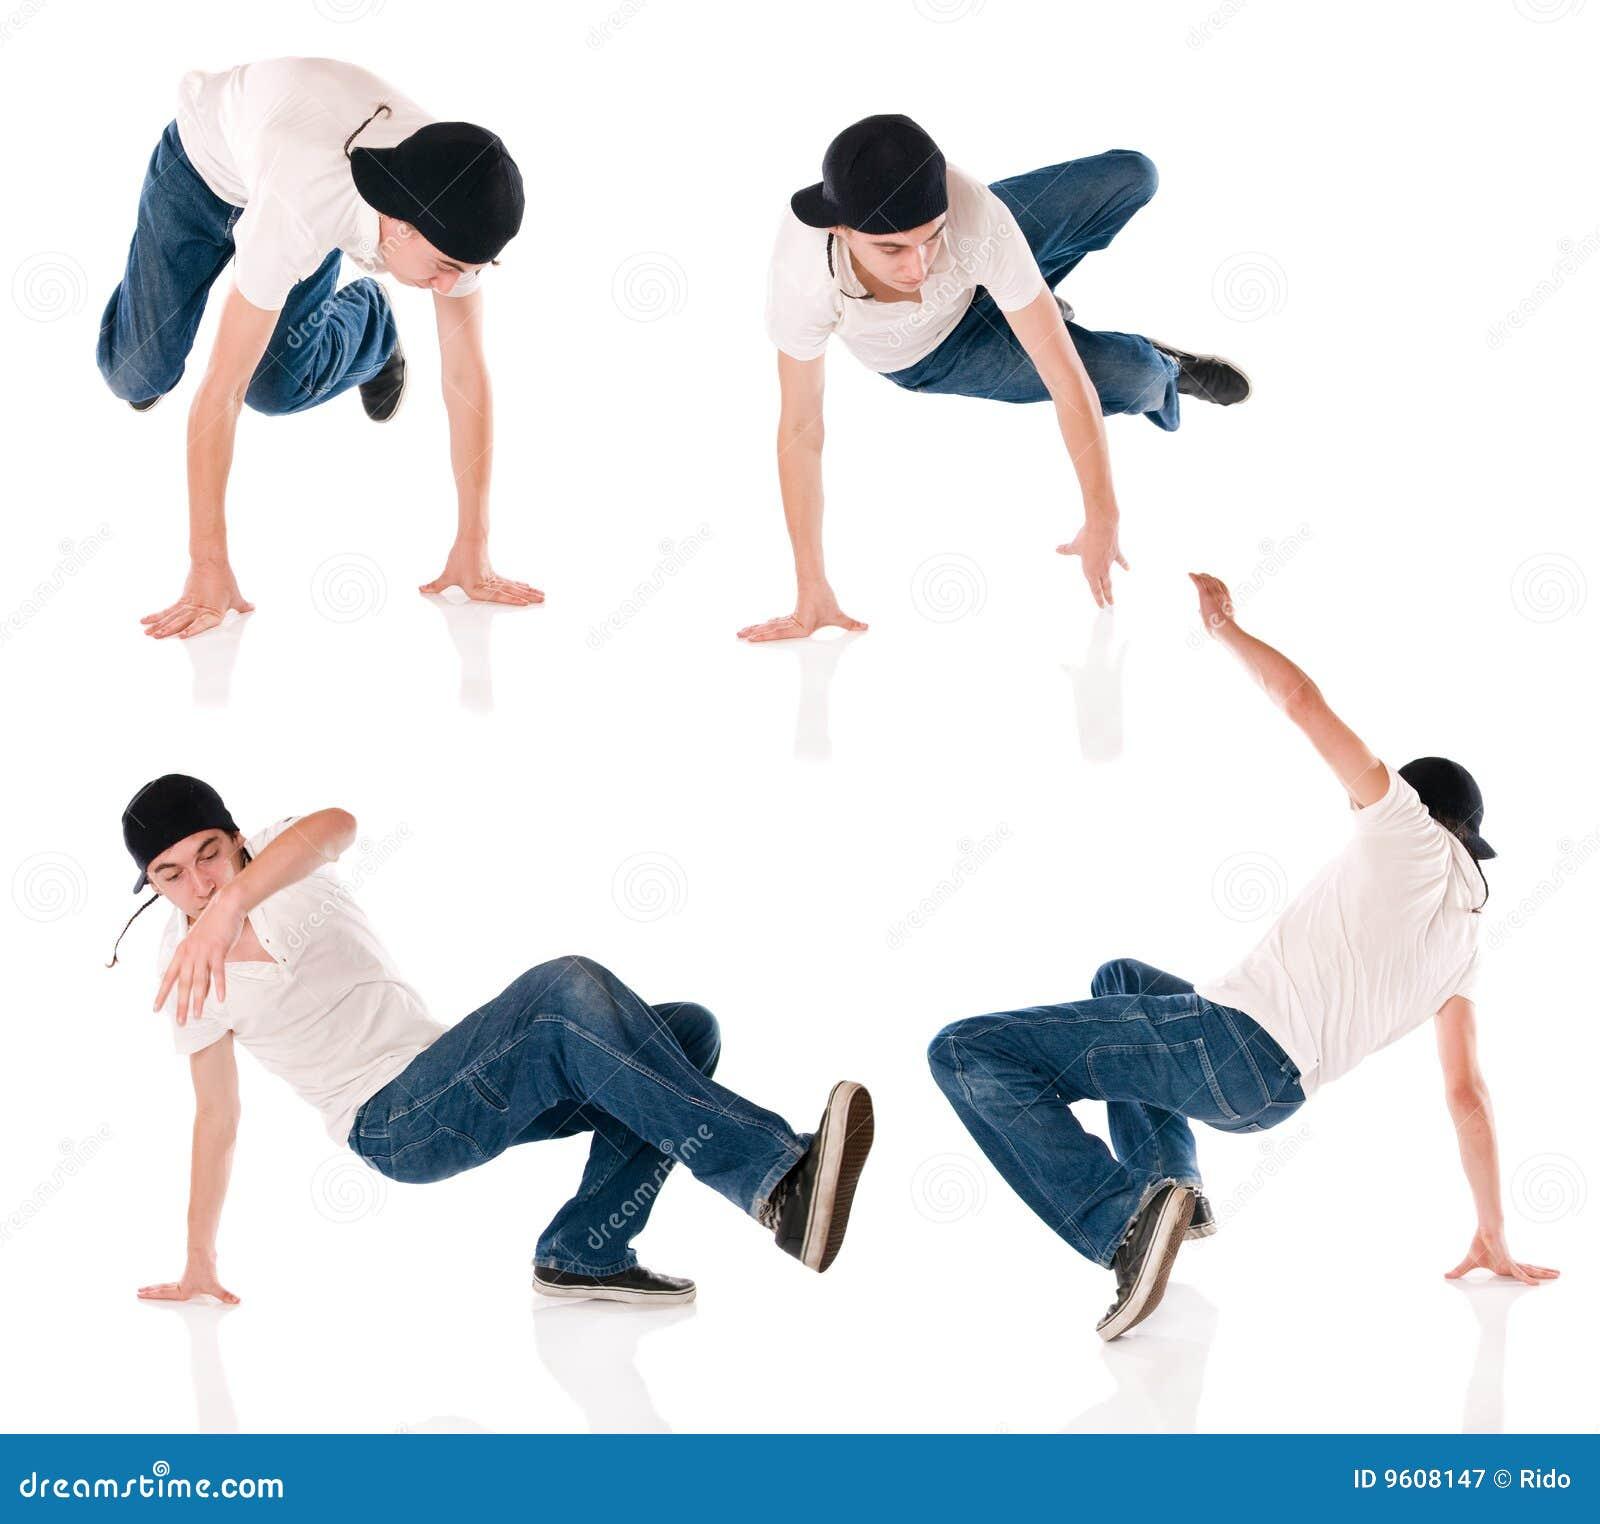 Posizioni di Breakdancing